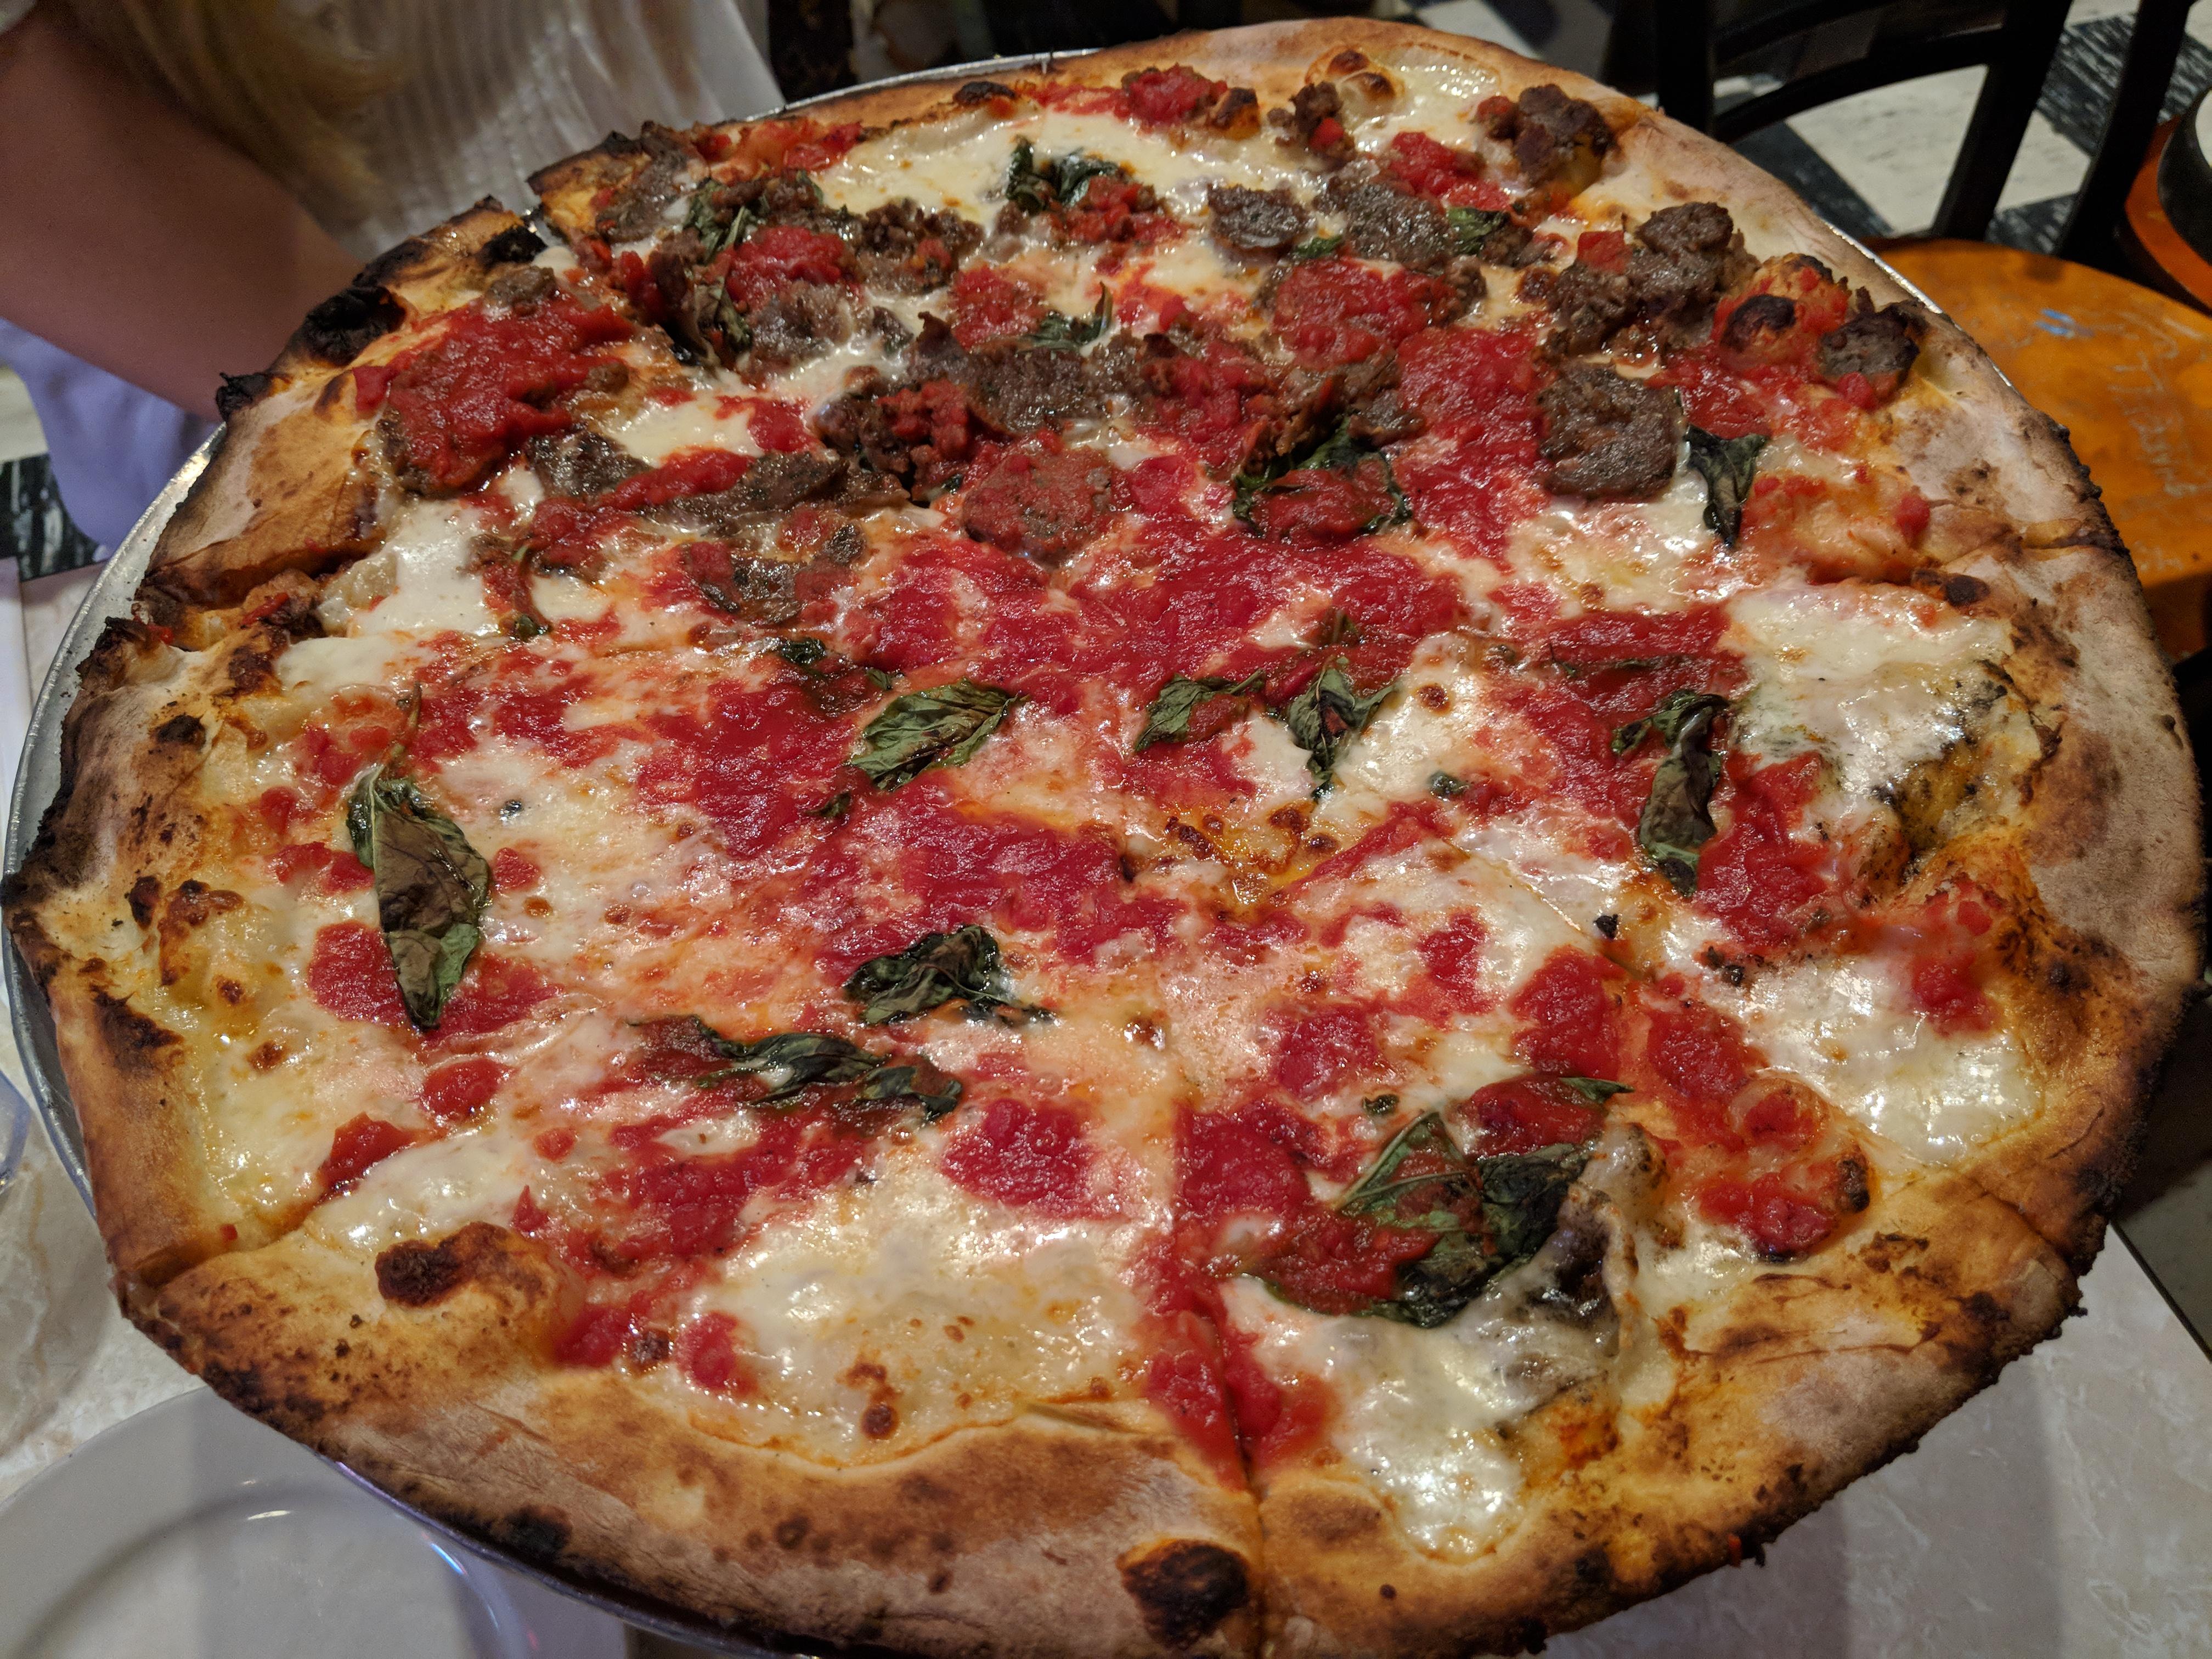 swine_is_fine on One Bite Pizza App